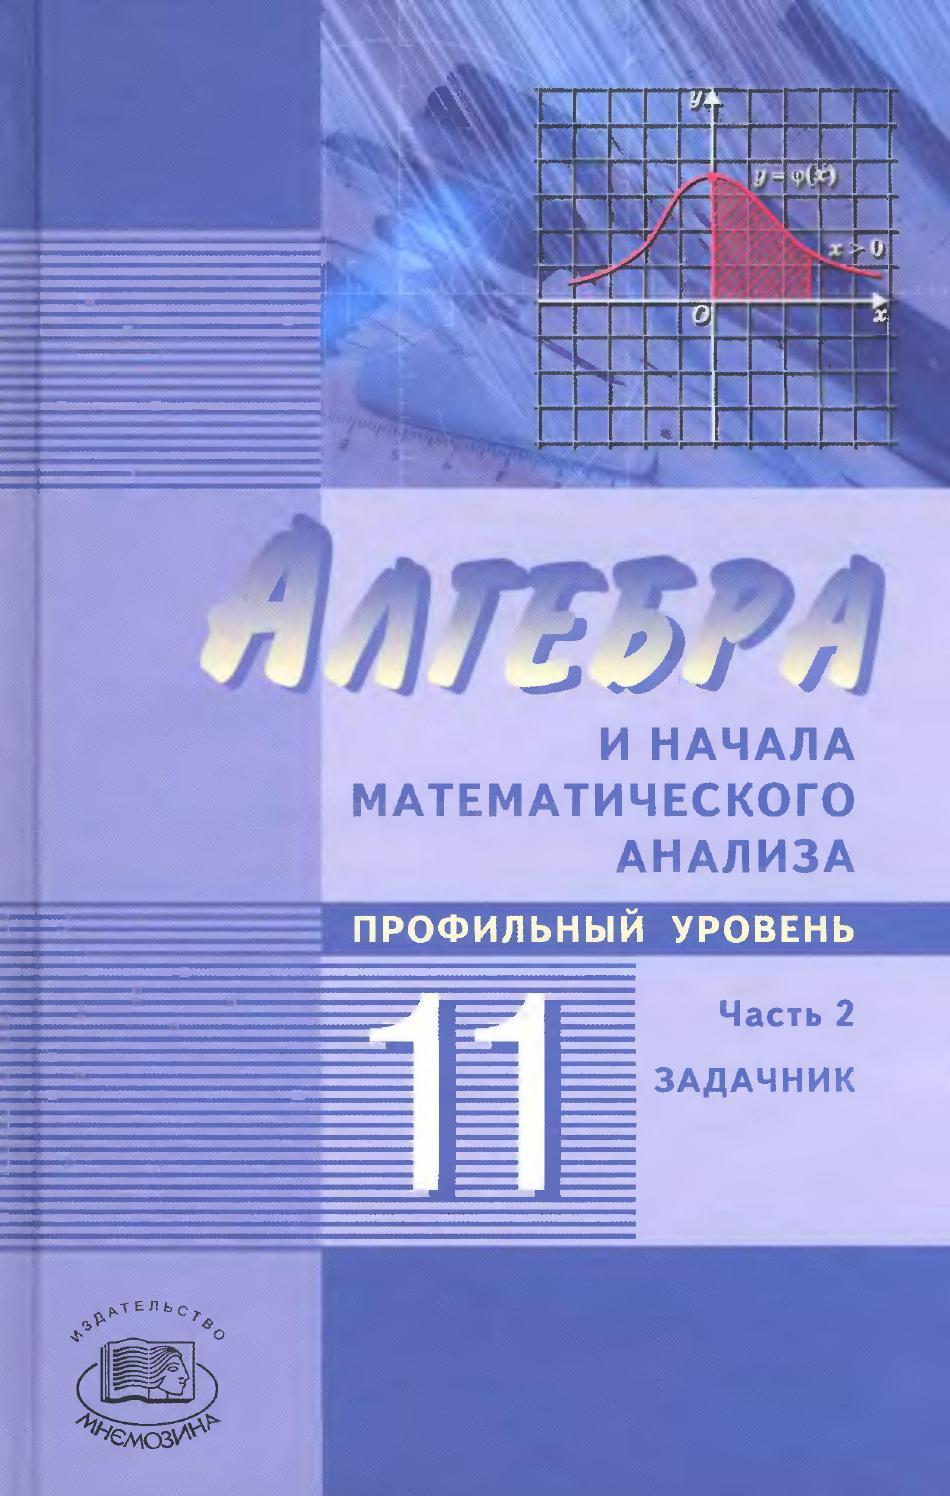 Решебник по алгебре и начало математического анализа 11 класс мордкович